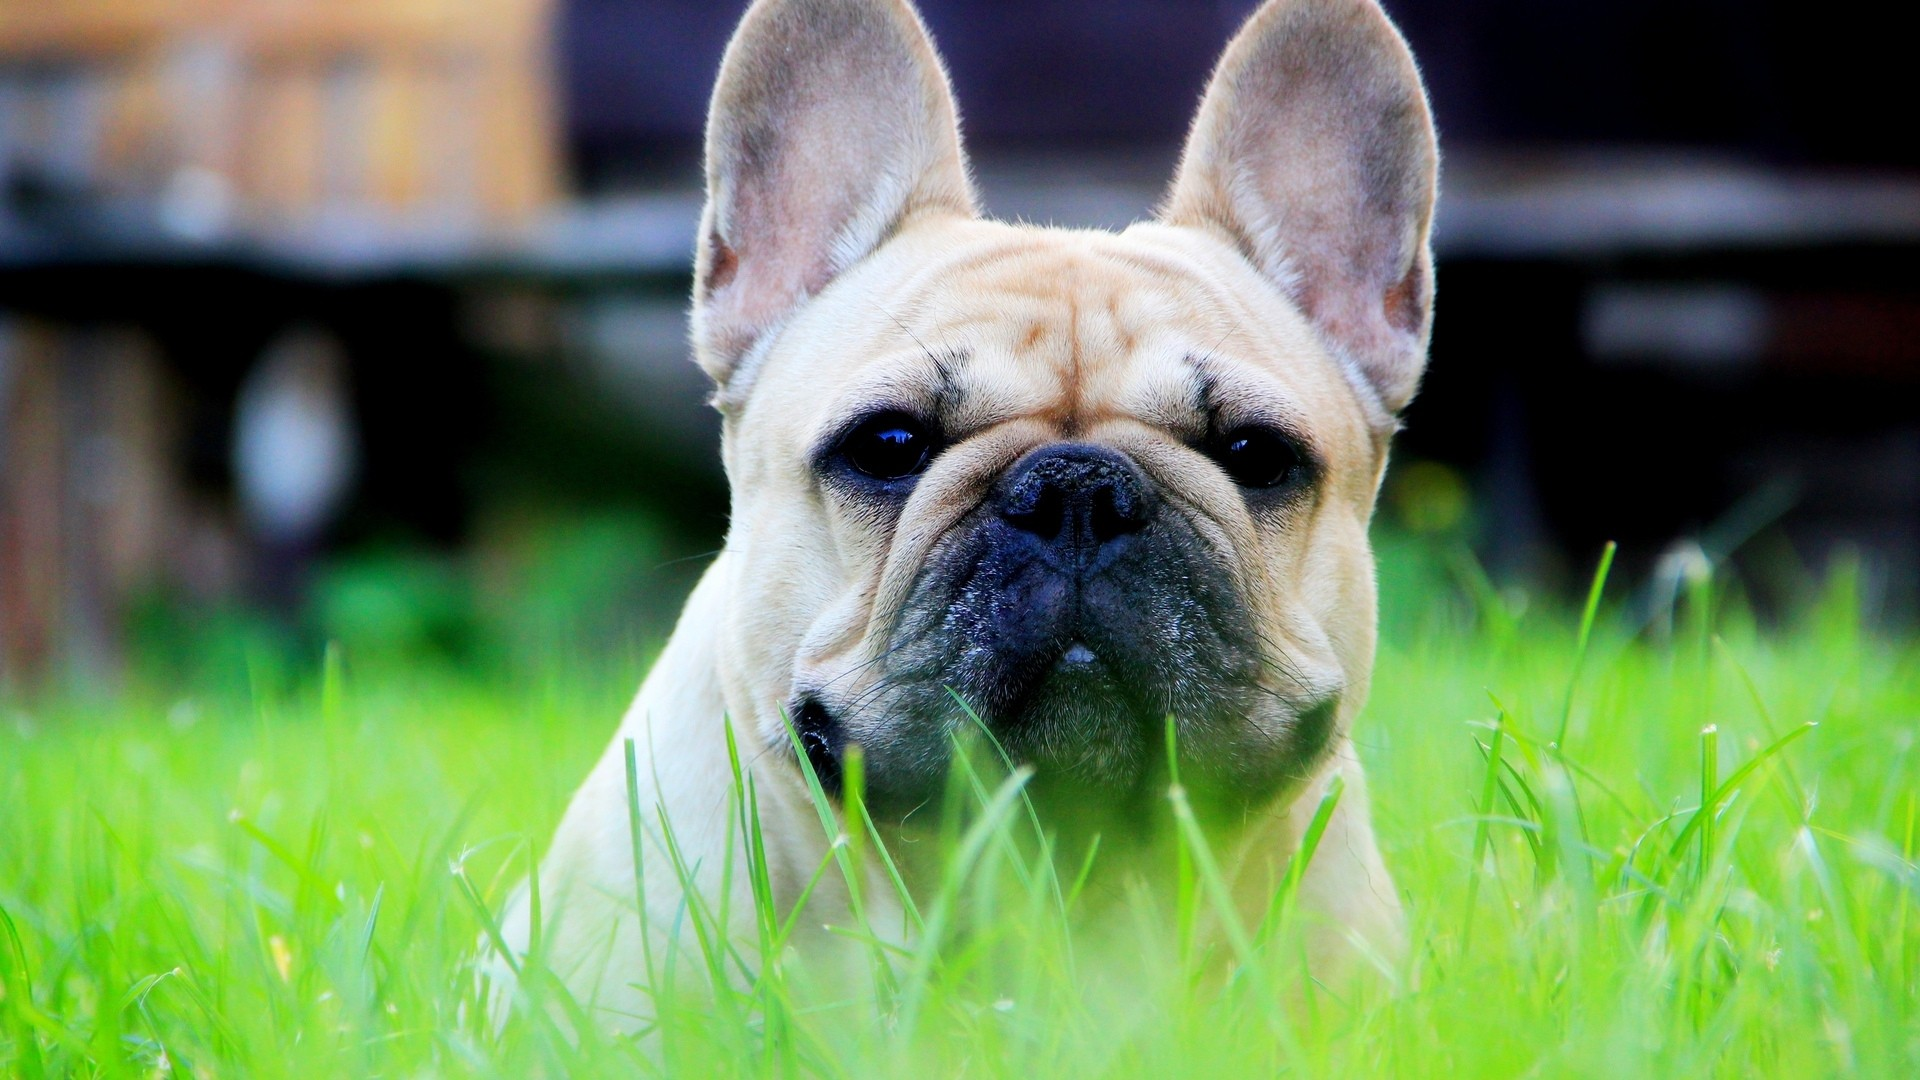 French Bulldog hd wallpaper download